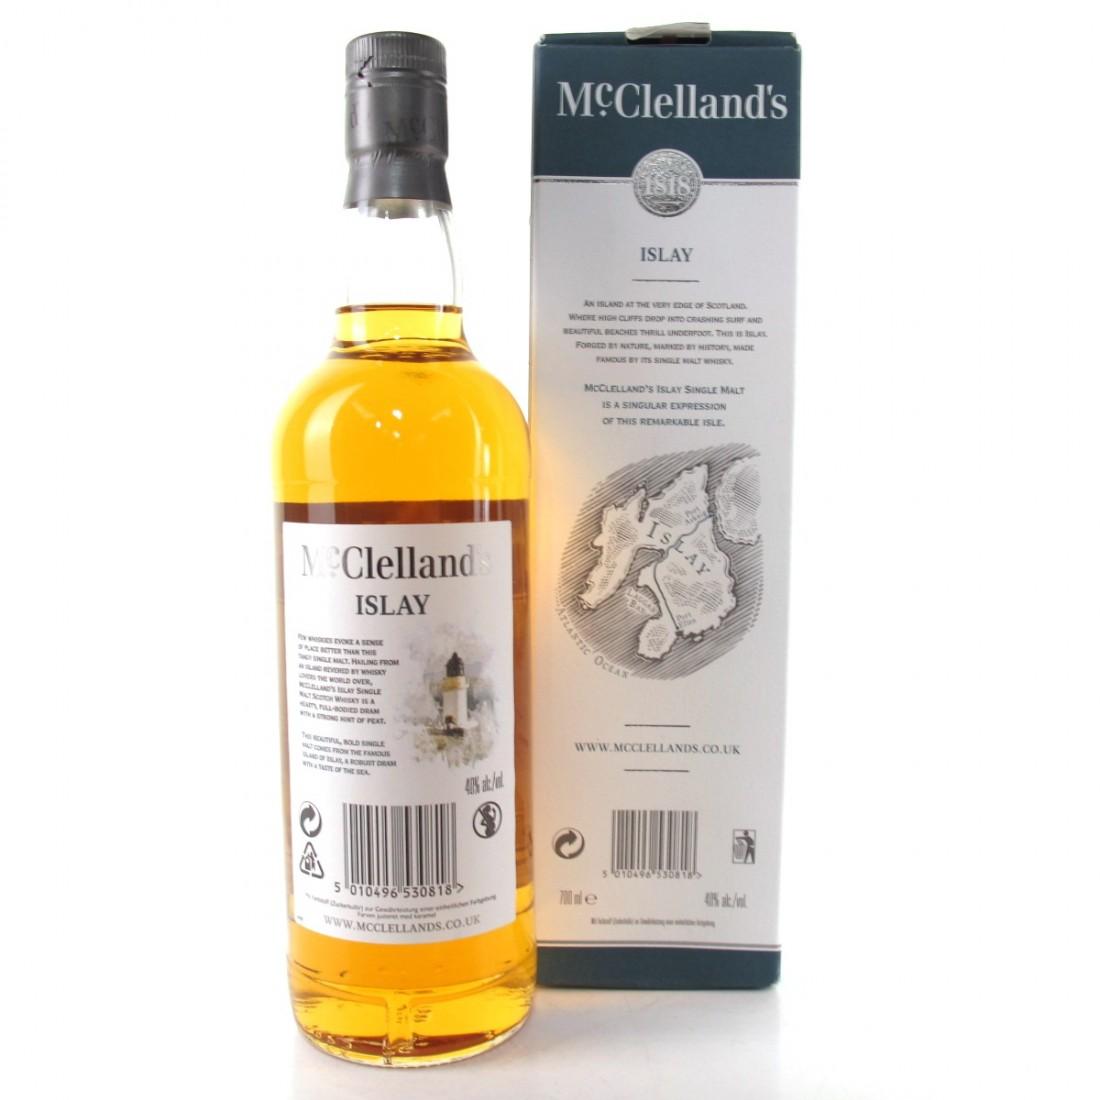 McClelland's Islay Single Malt